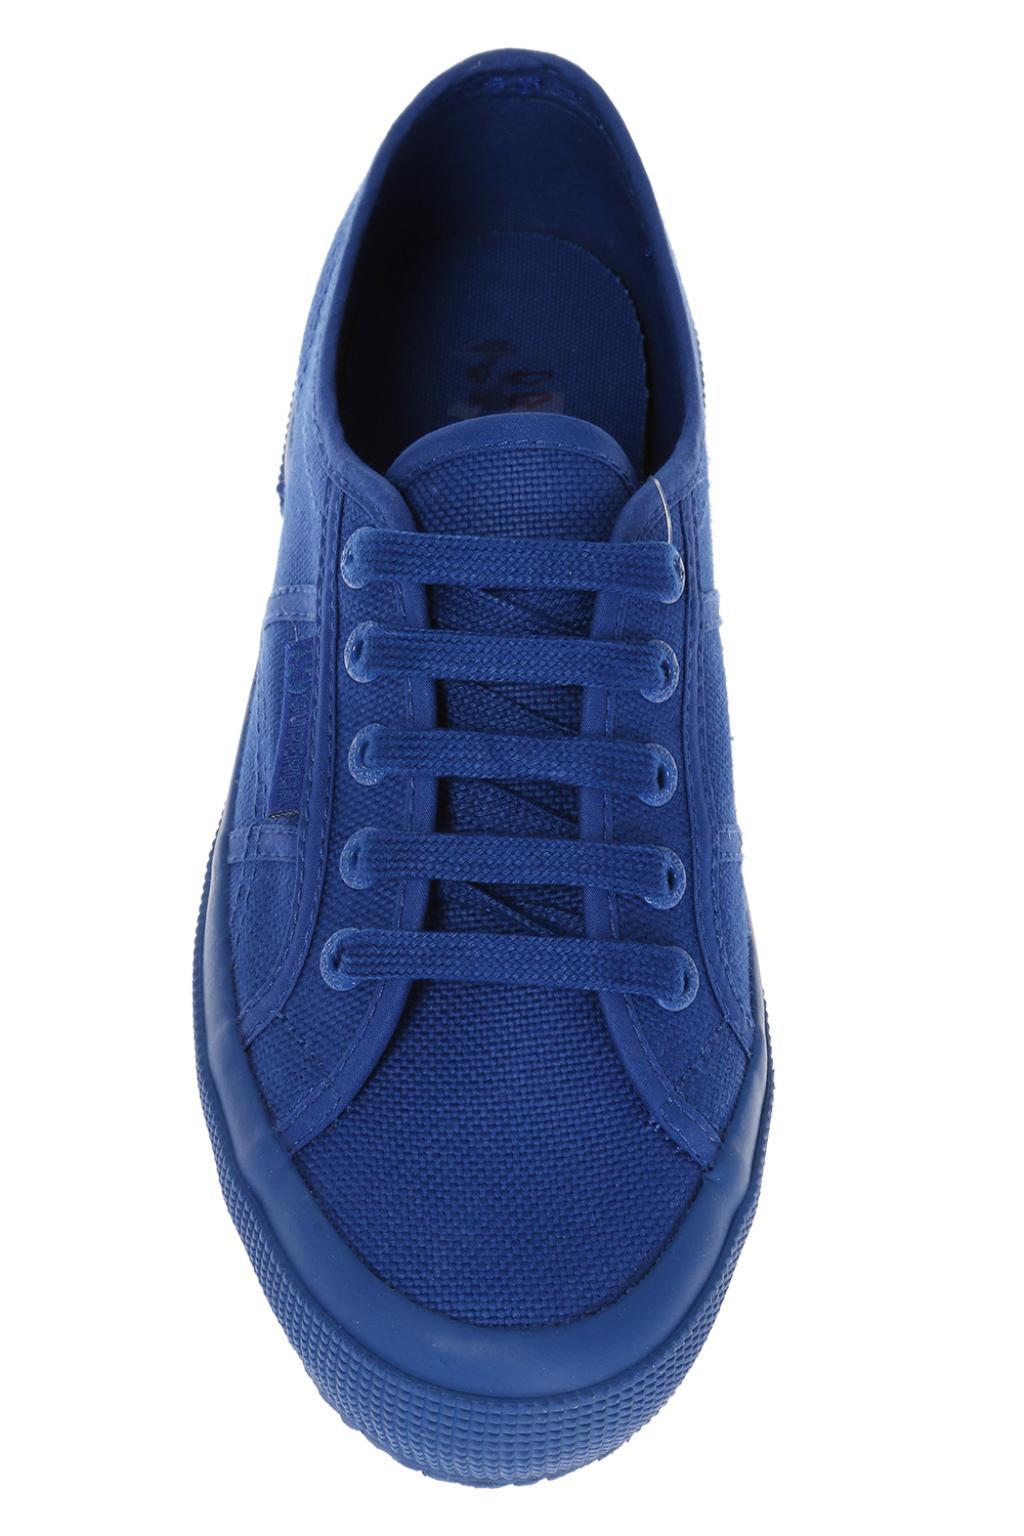 Superga 'Cotu Classic' lace-up sneakers